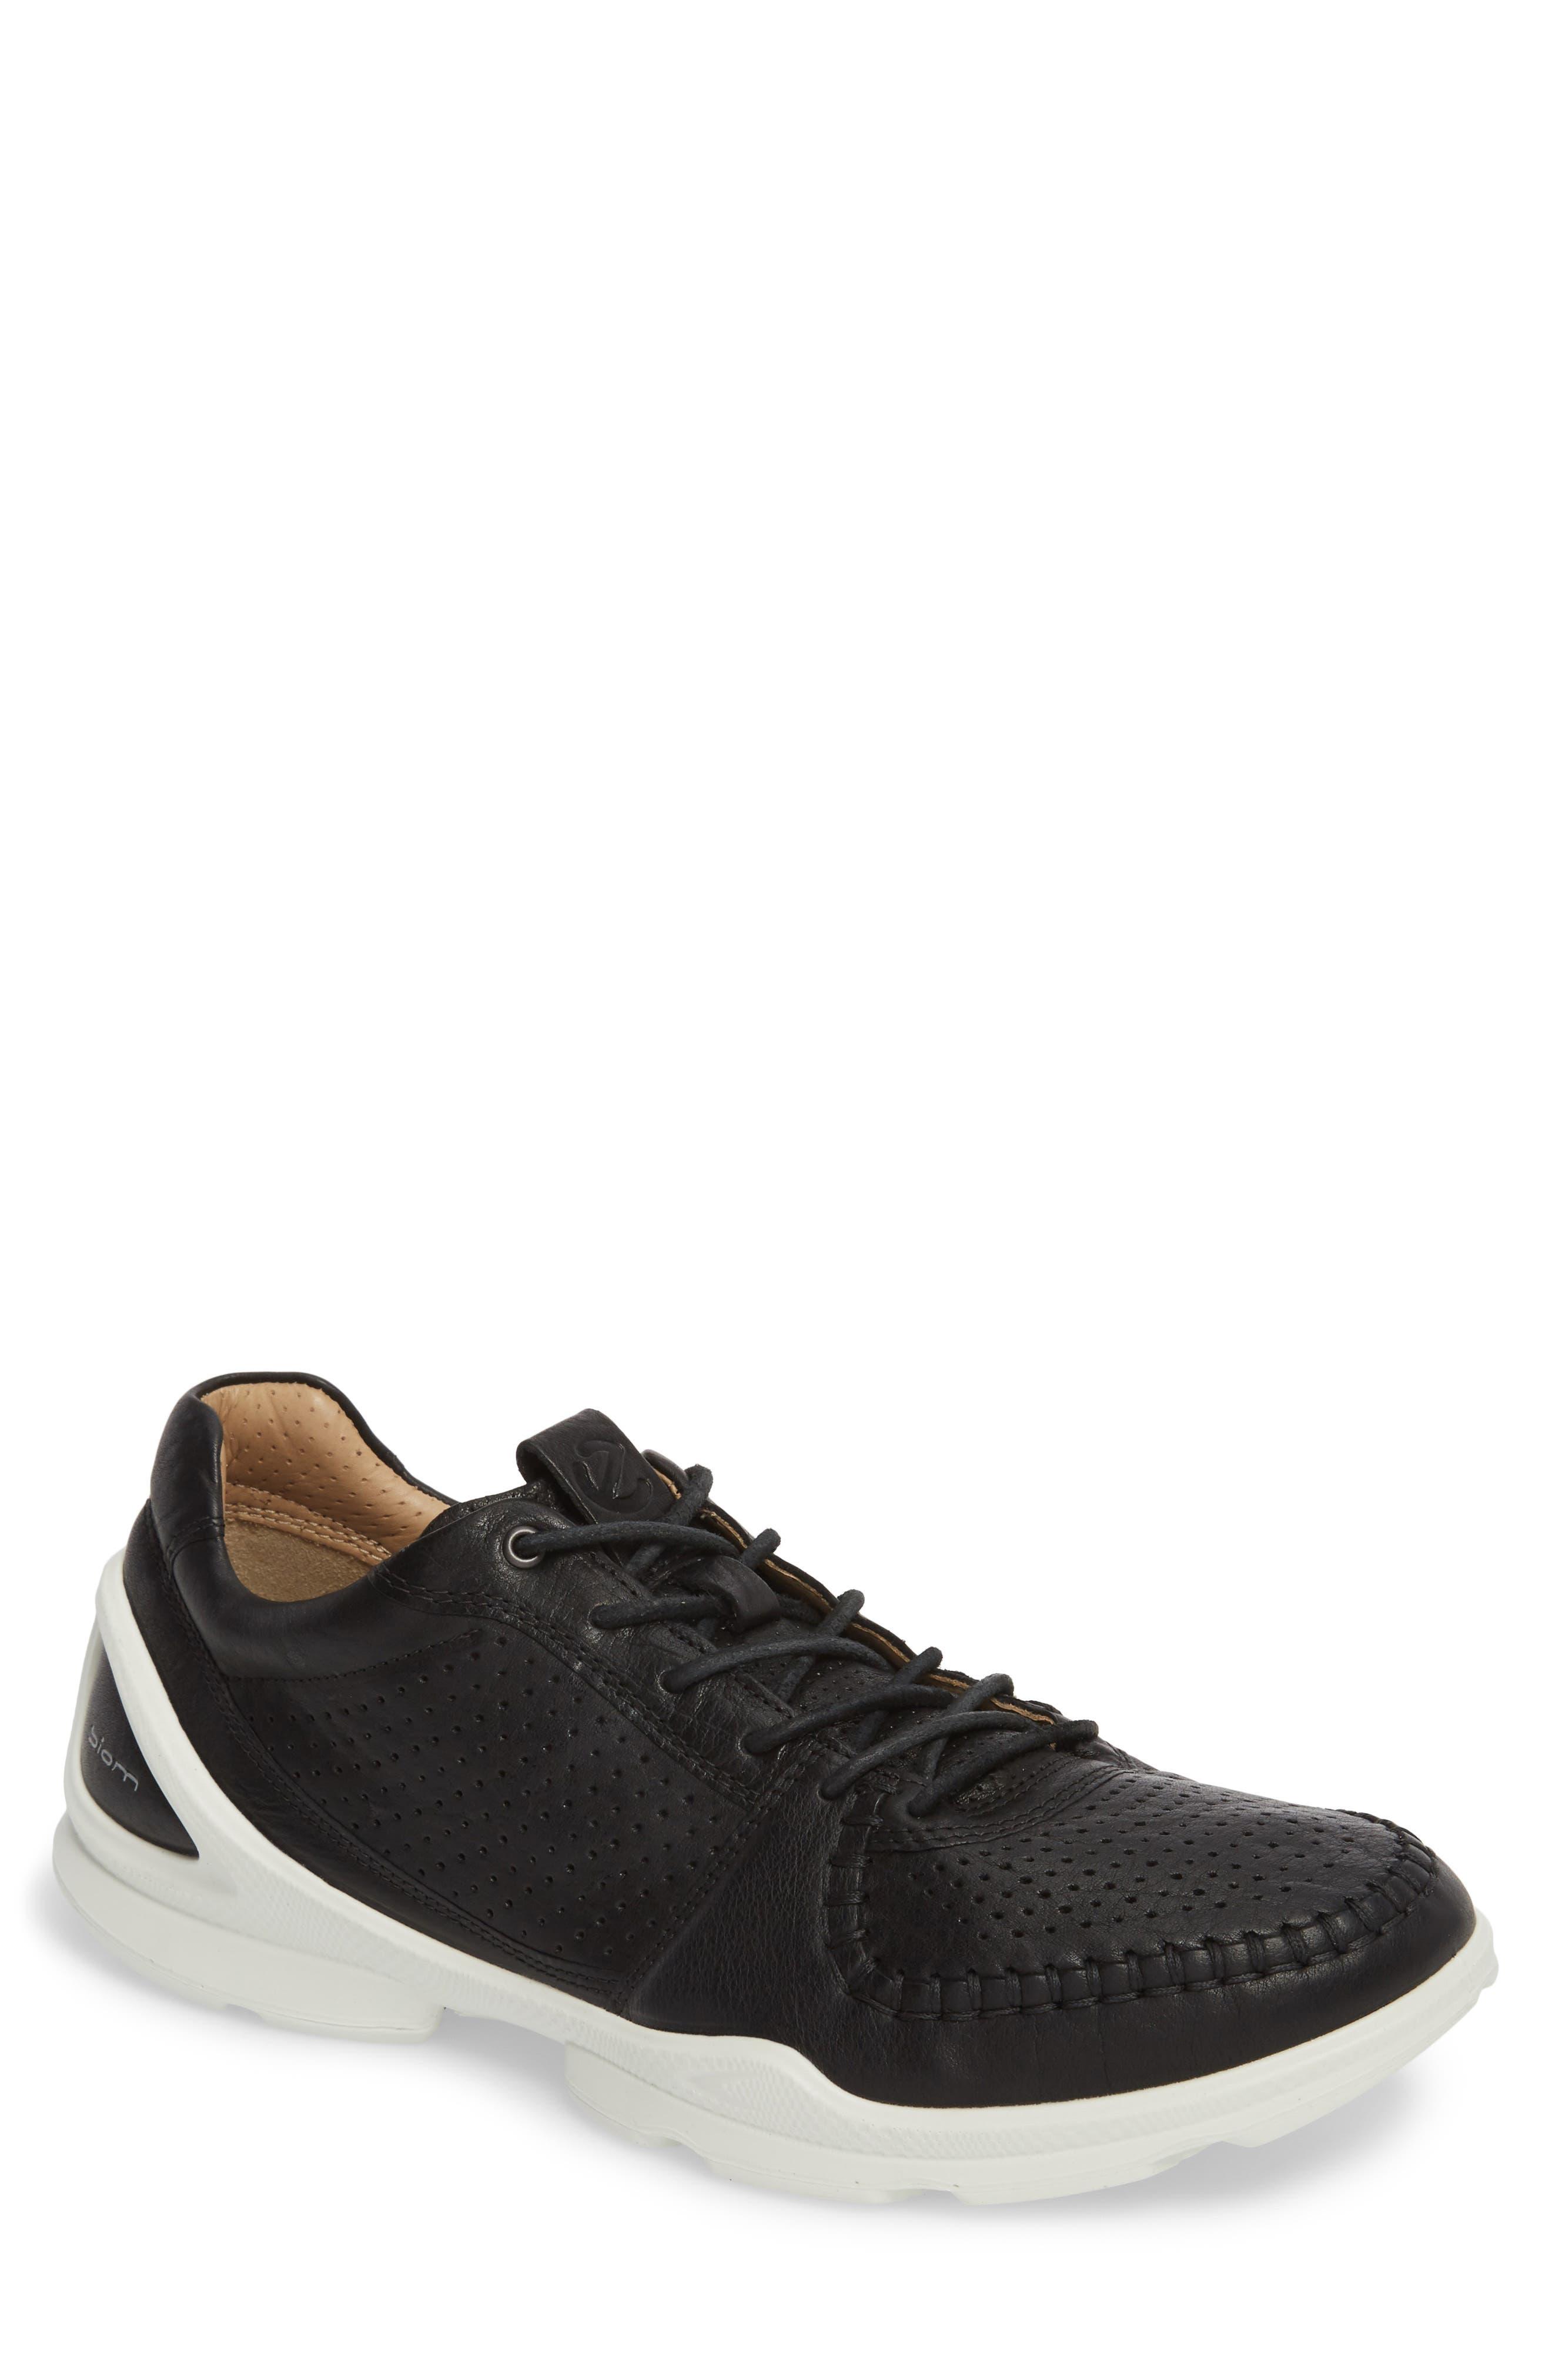 BIOM Street Moc Toe Sneaker,                             Main thumbnail 1, color,                             Black Leather